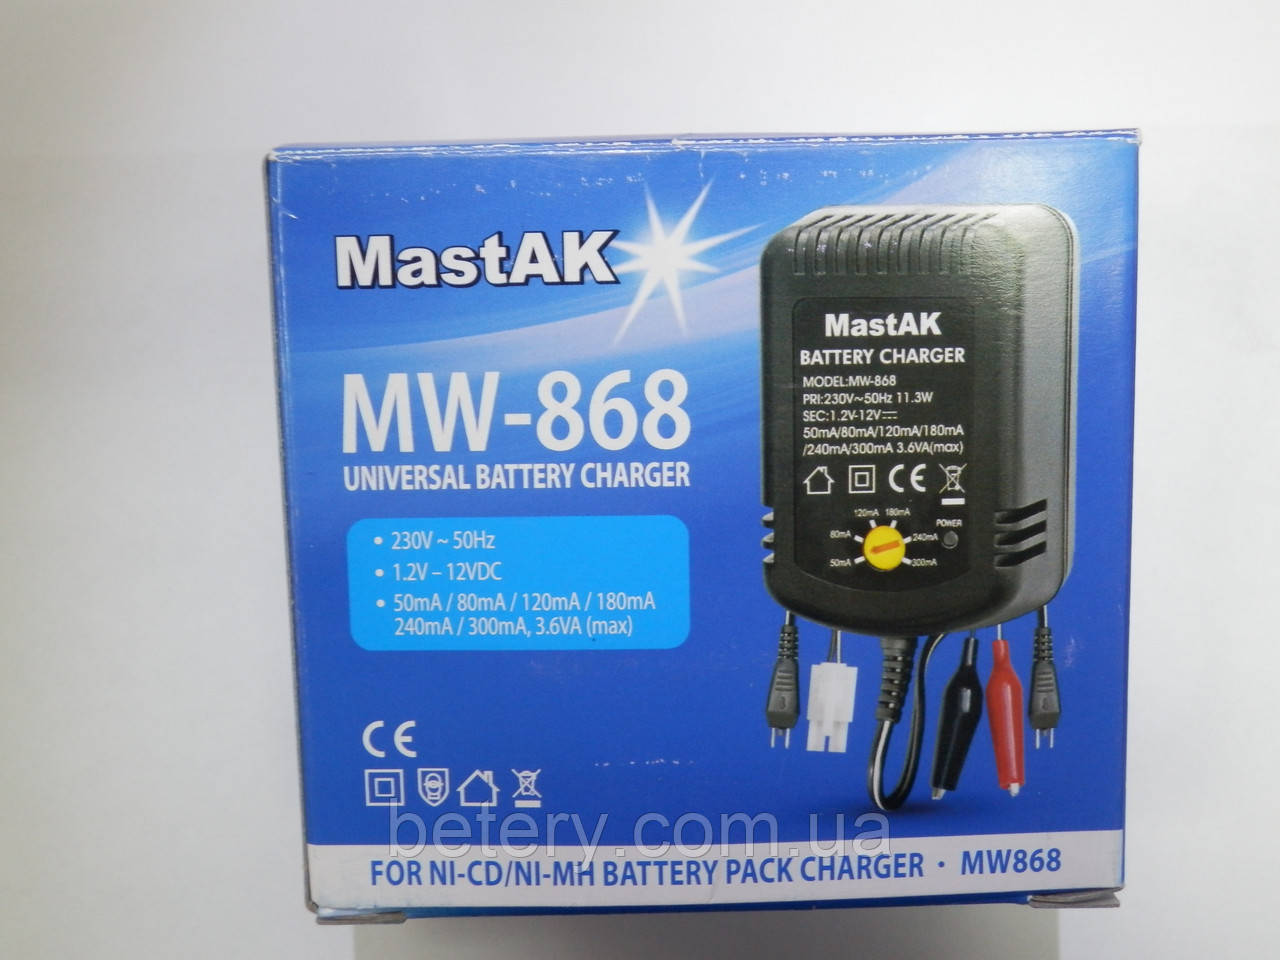 Универсальное зарядное устройство для Ni-Mh аккумуляторов MastAK MW-868